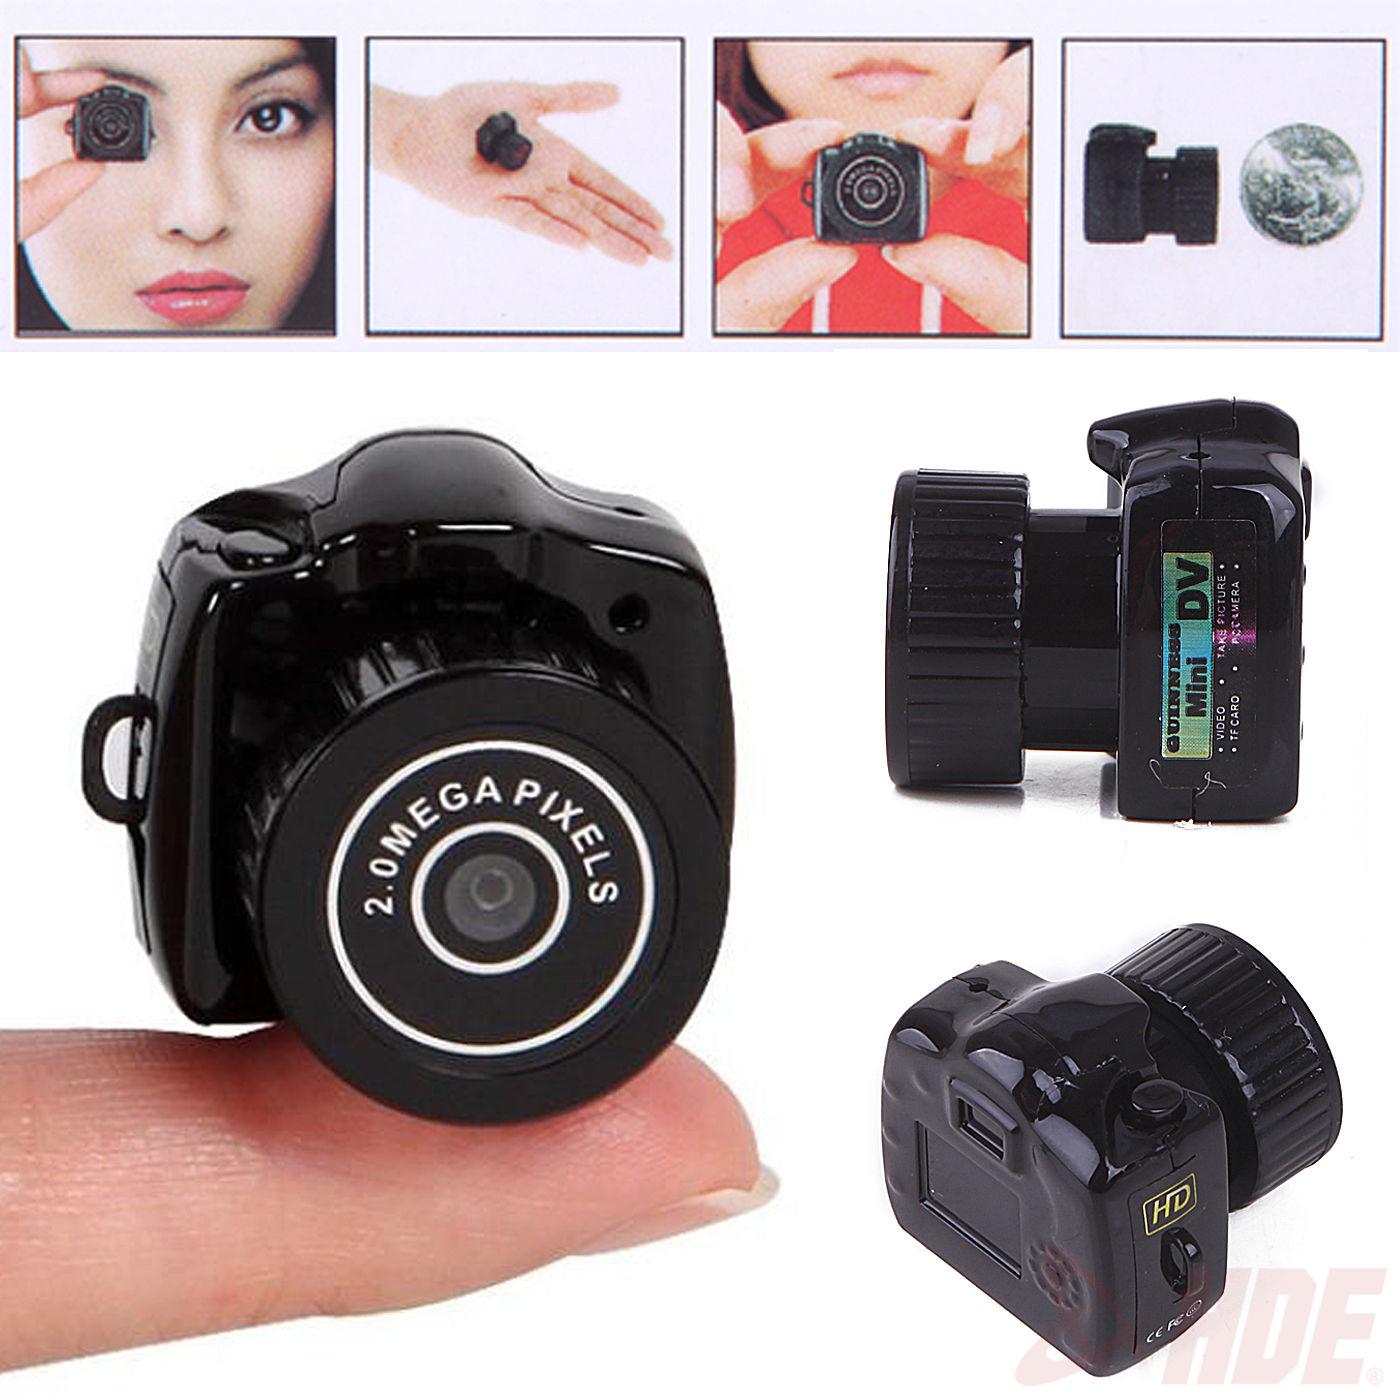 cam camera camera pinhole pinhole voyeur voyeur web webcamsbiz